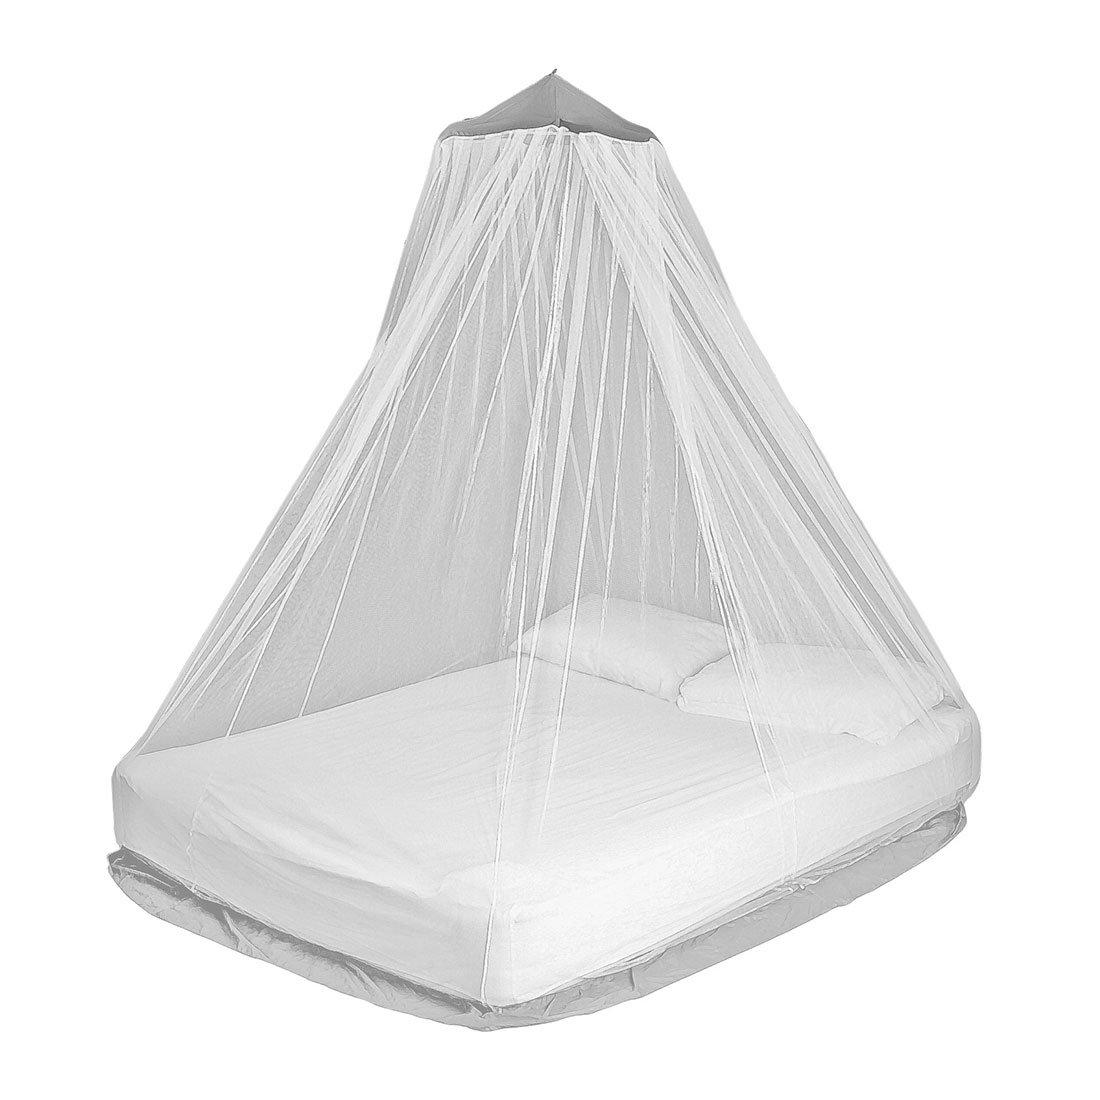 Double Mosquito Net Mosquito Net Lifesystems